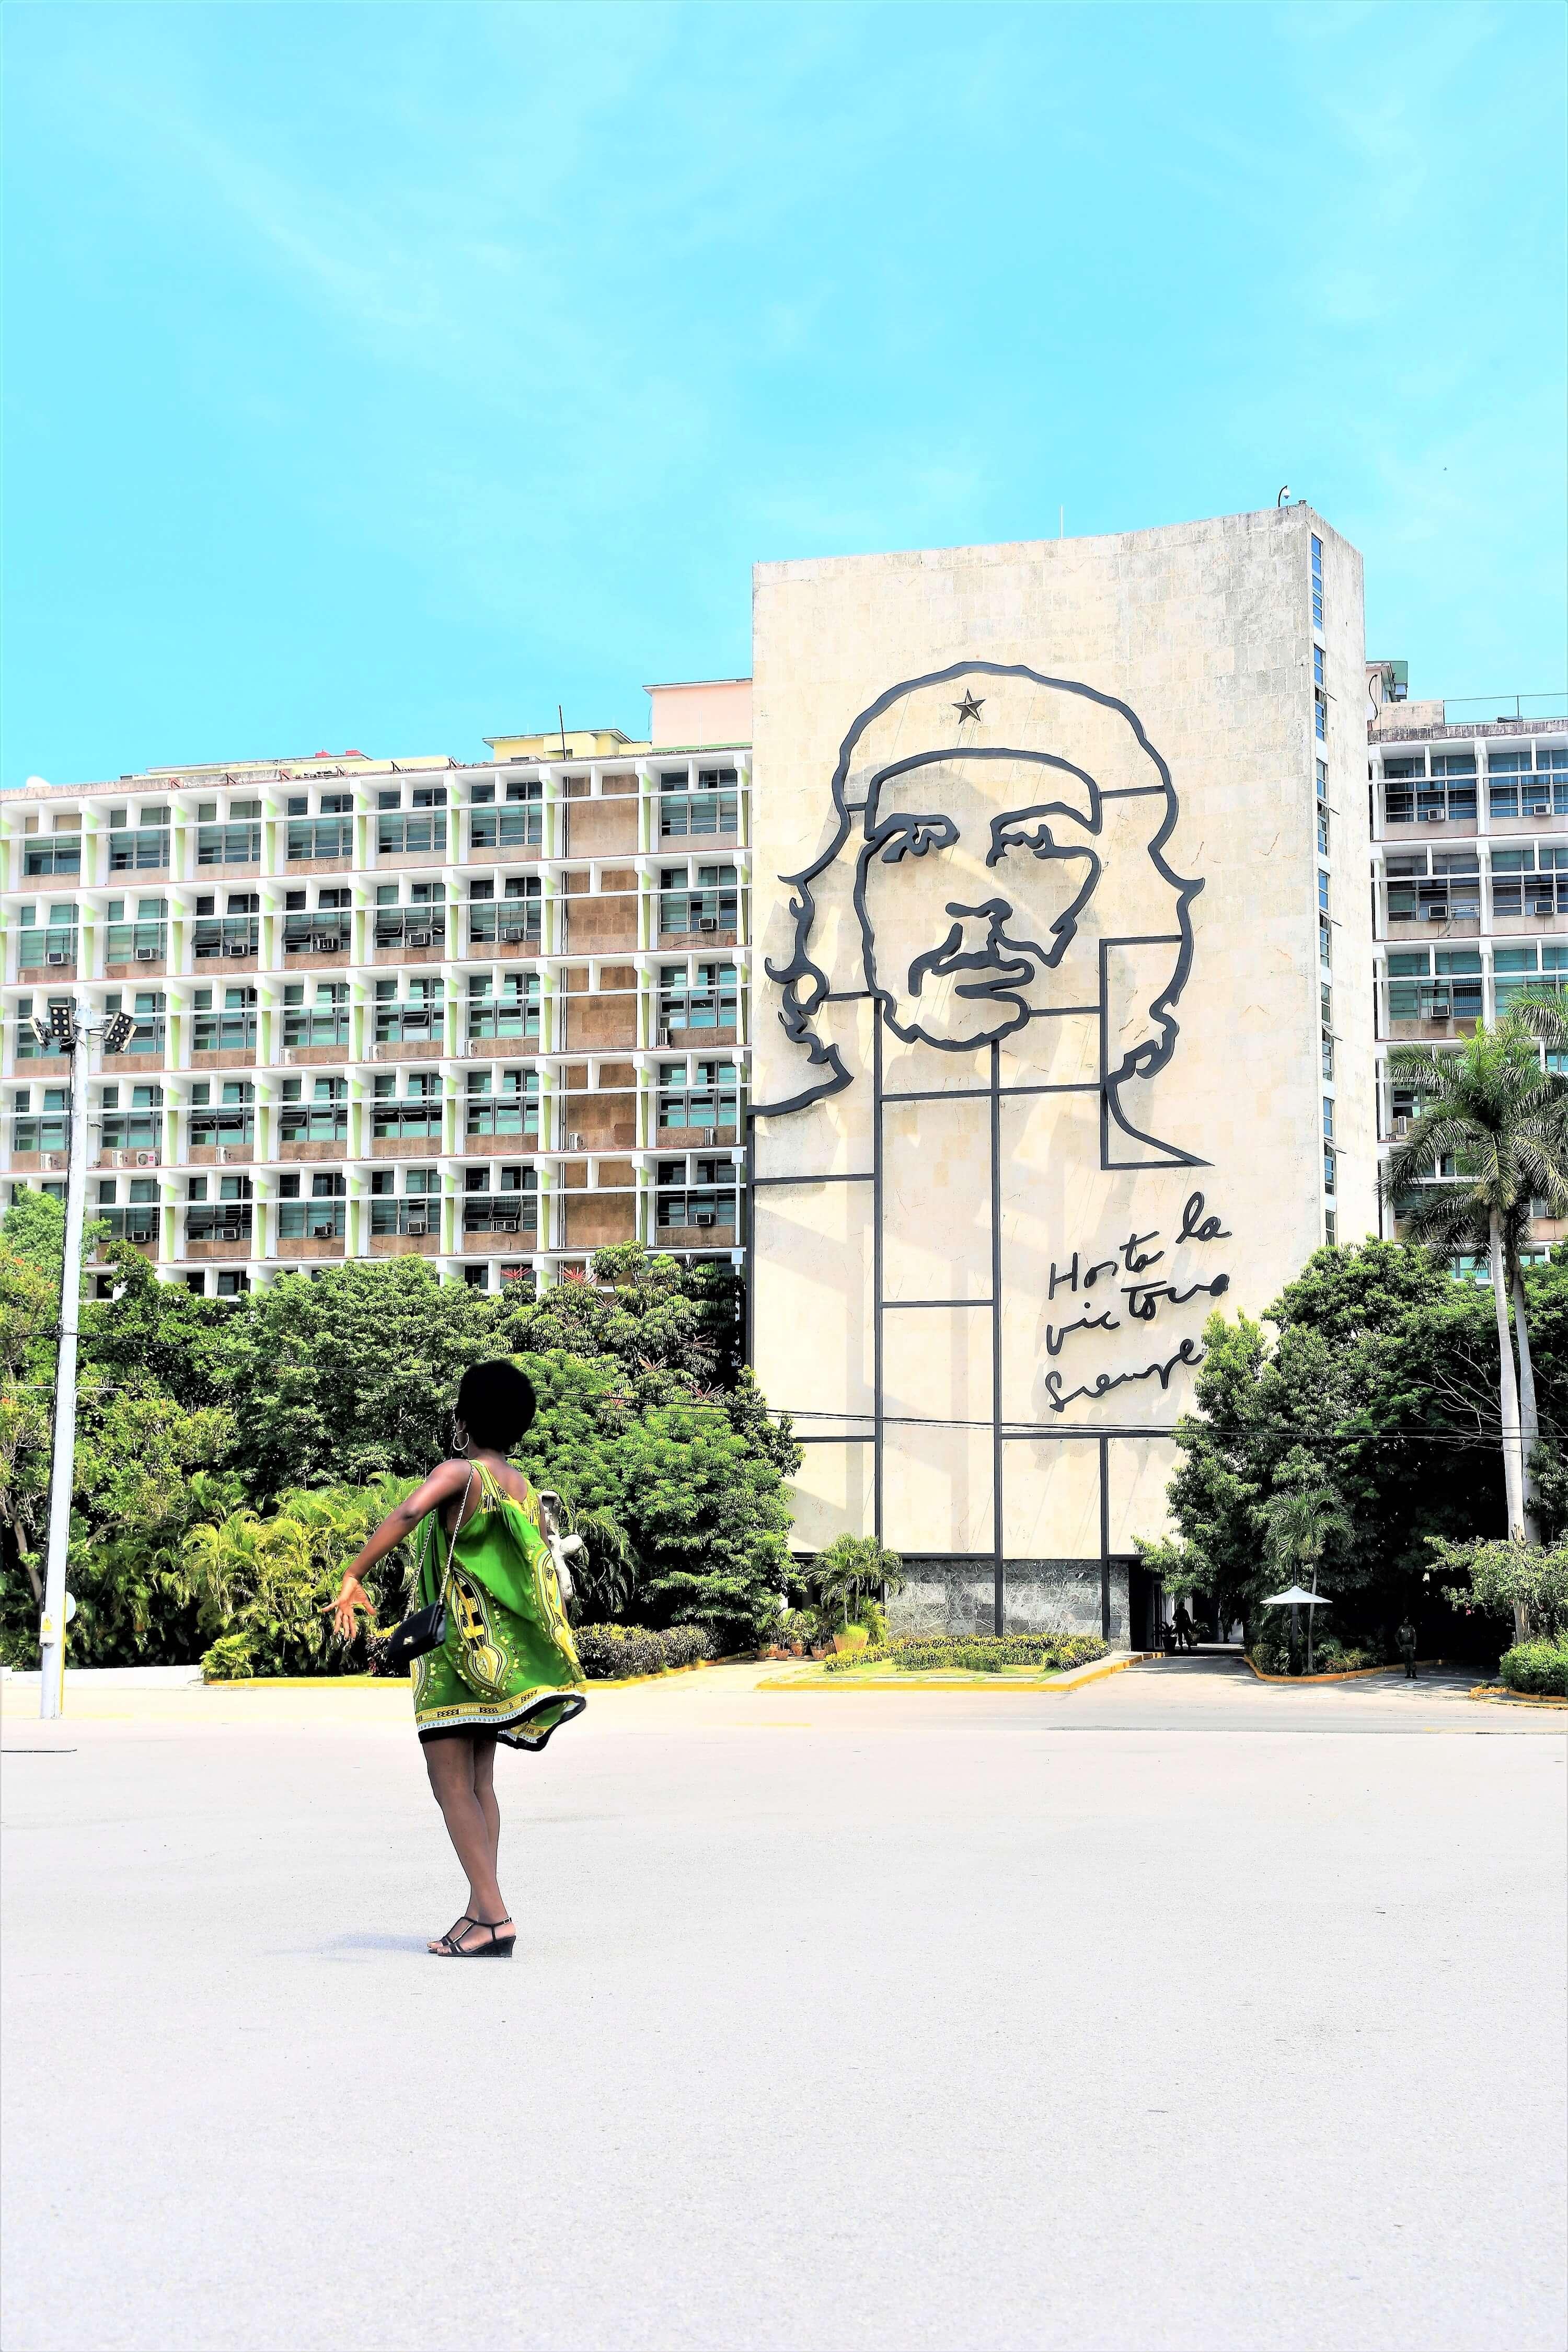 Cuba Travel Guide: Plaza de la Revolucion Havana